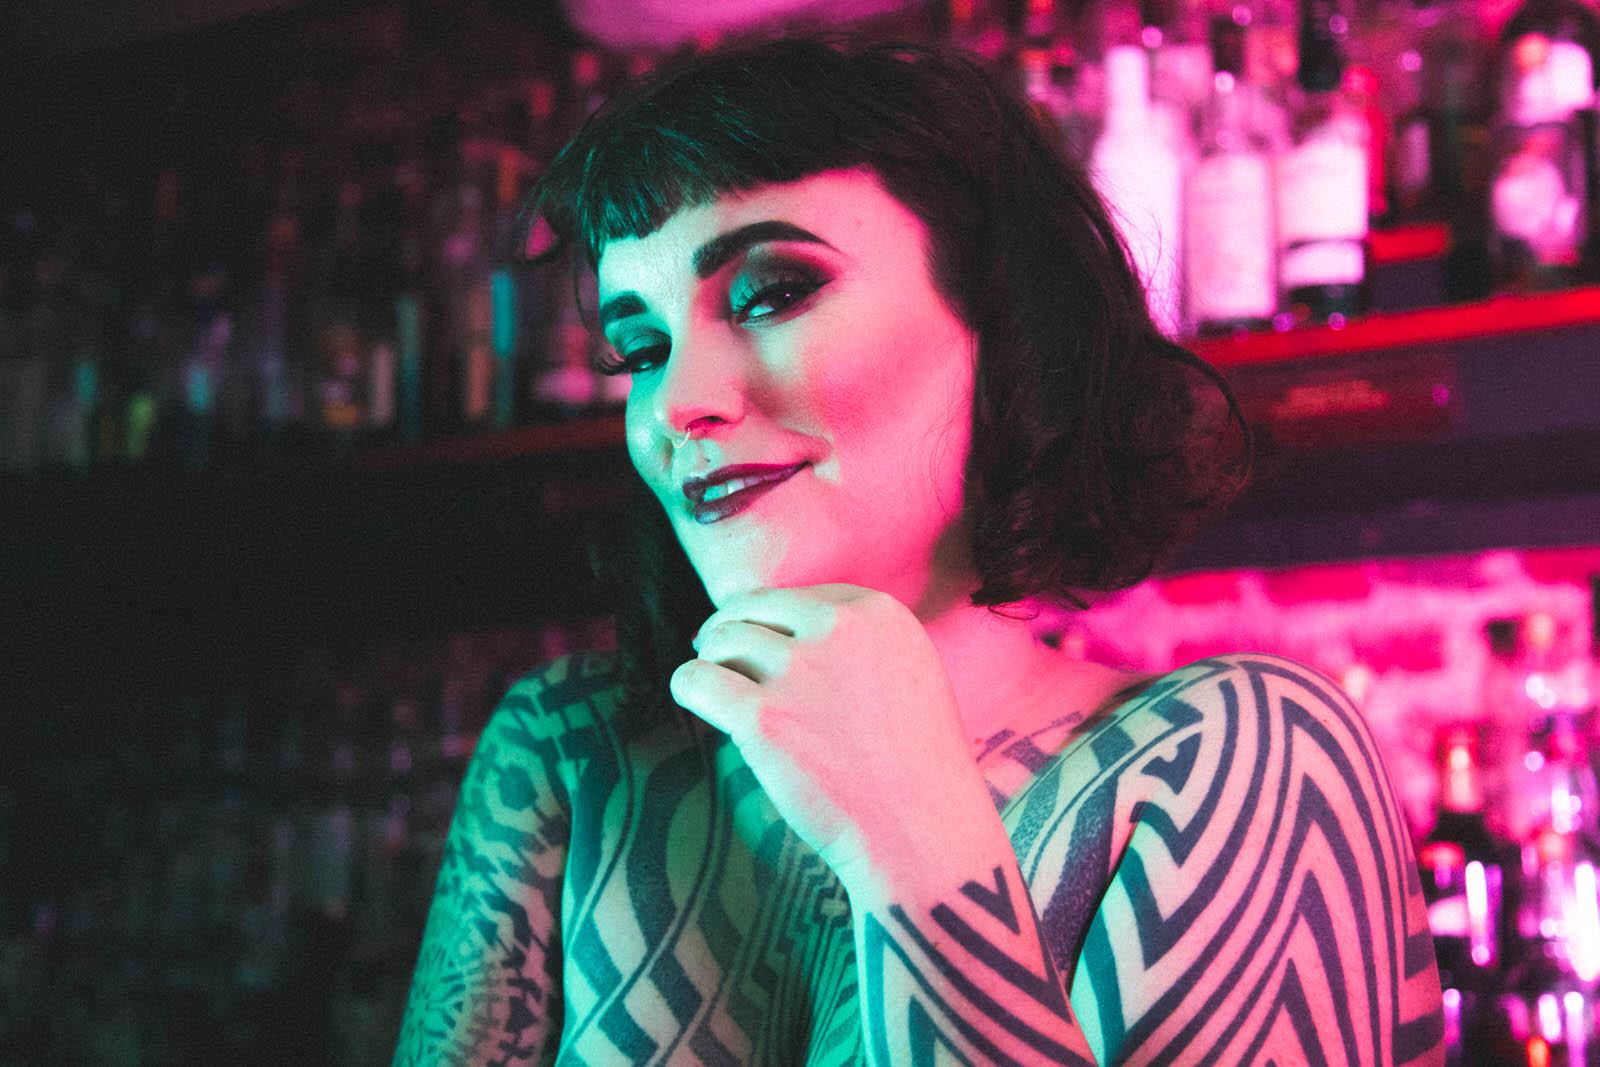 miss tallula whisky mistress whisky date whisky bar sydney london scottish whisky tattooed dominatrix